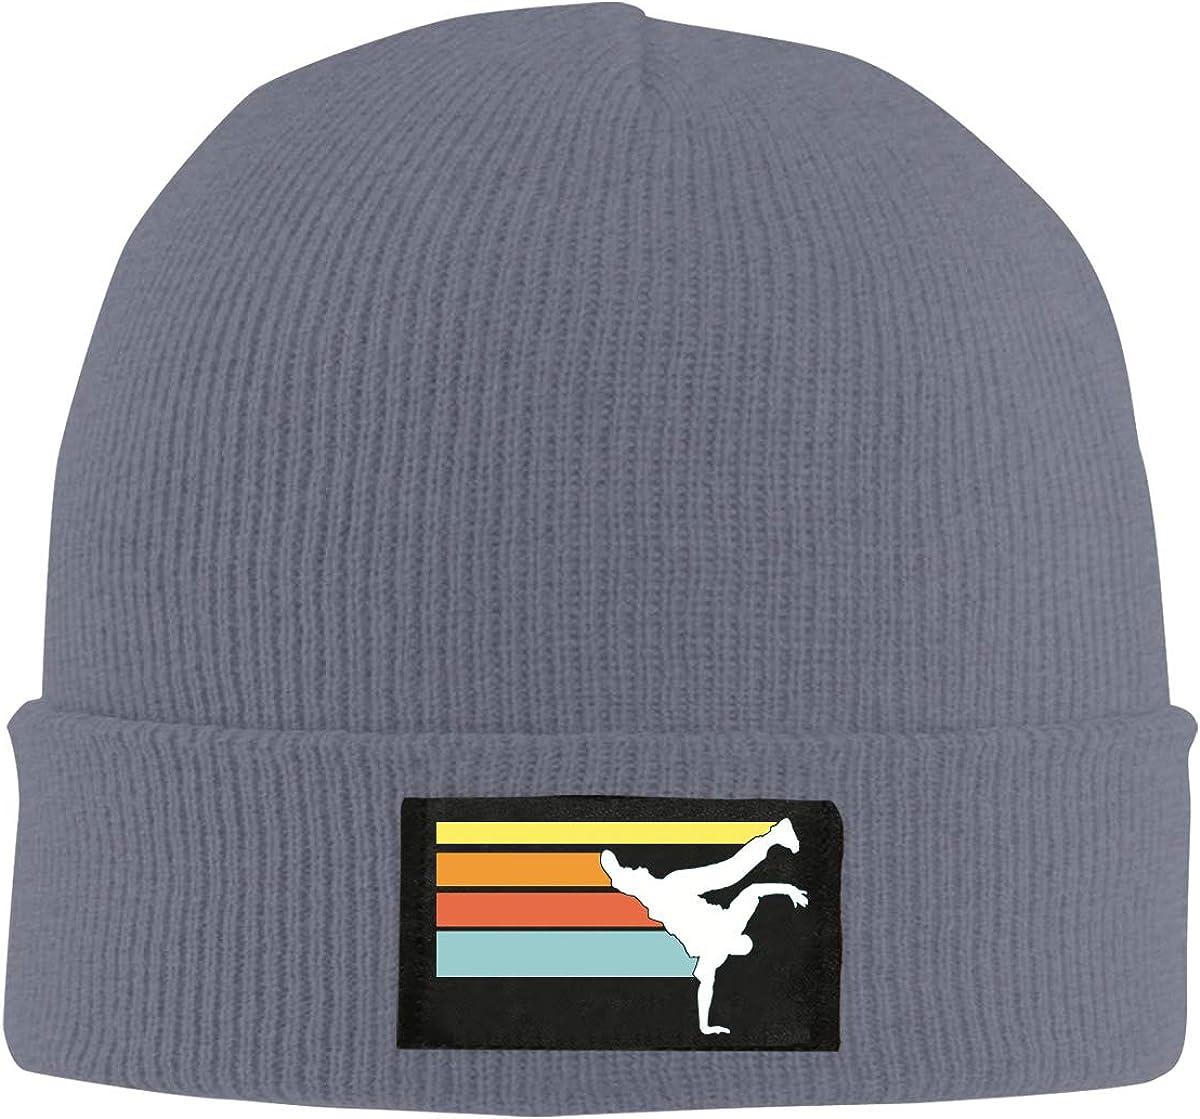 Unisex Vintage Hip Hop Breakdance Knitted Hat 100/% Acrylic Winter Beanies Cap